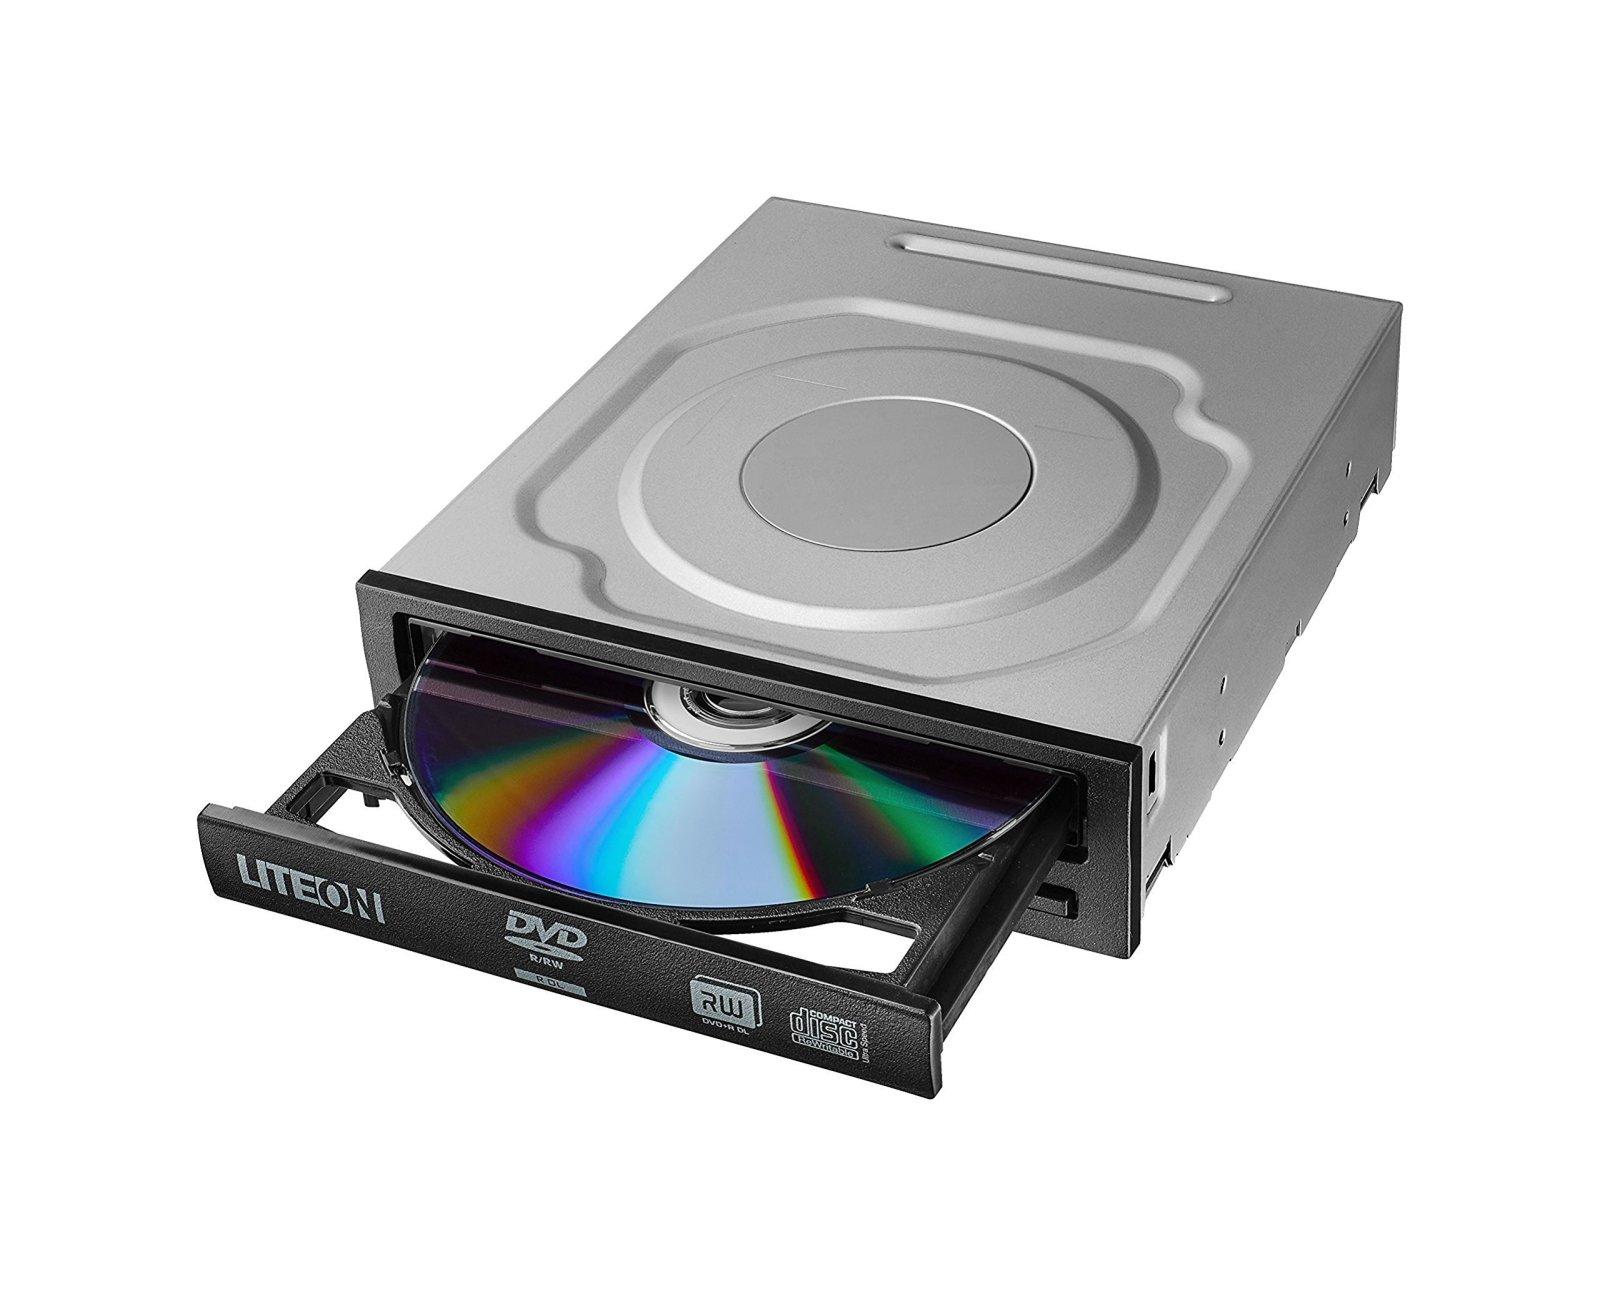 liteon dvd rw 24x pc internal sata optical drive device recording dvd cd discs 4718390028165 ebay. Black Bedroom Furniture Sets. Home Design Ideas